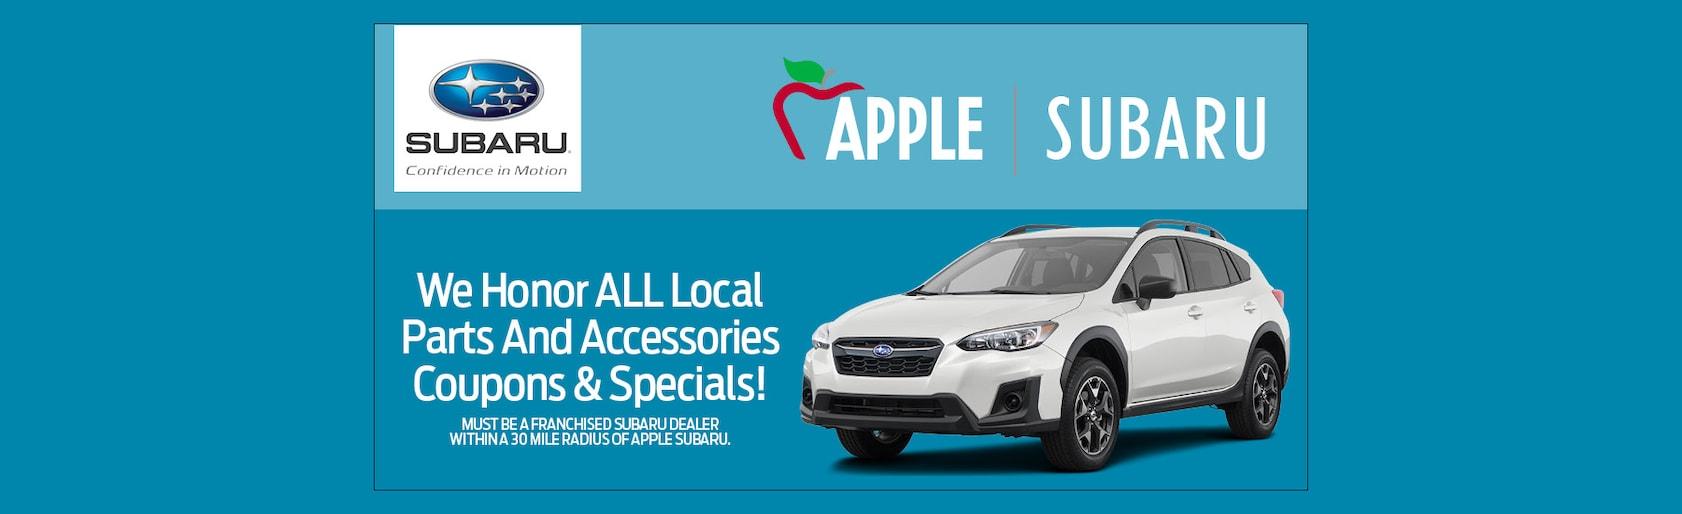 Apple Subaru in York, PA | Subaru Sales & Service in York County